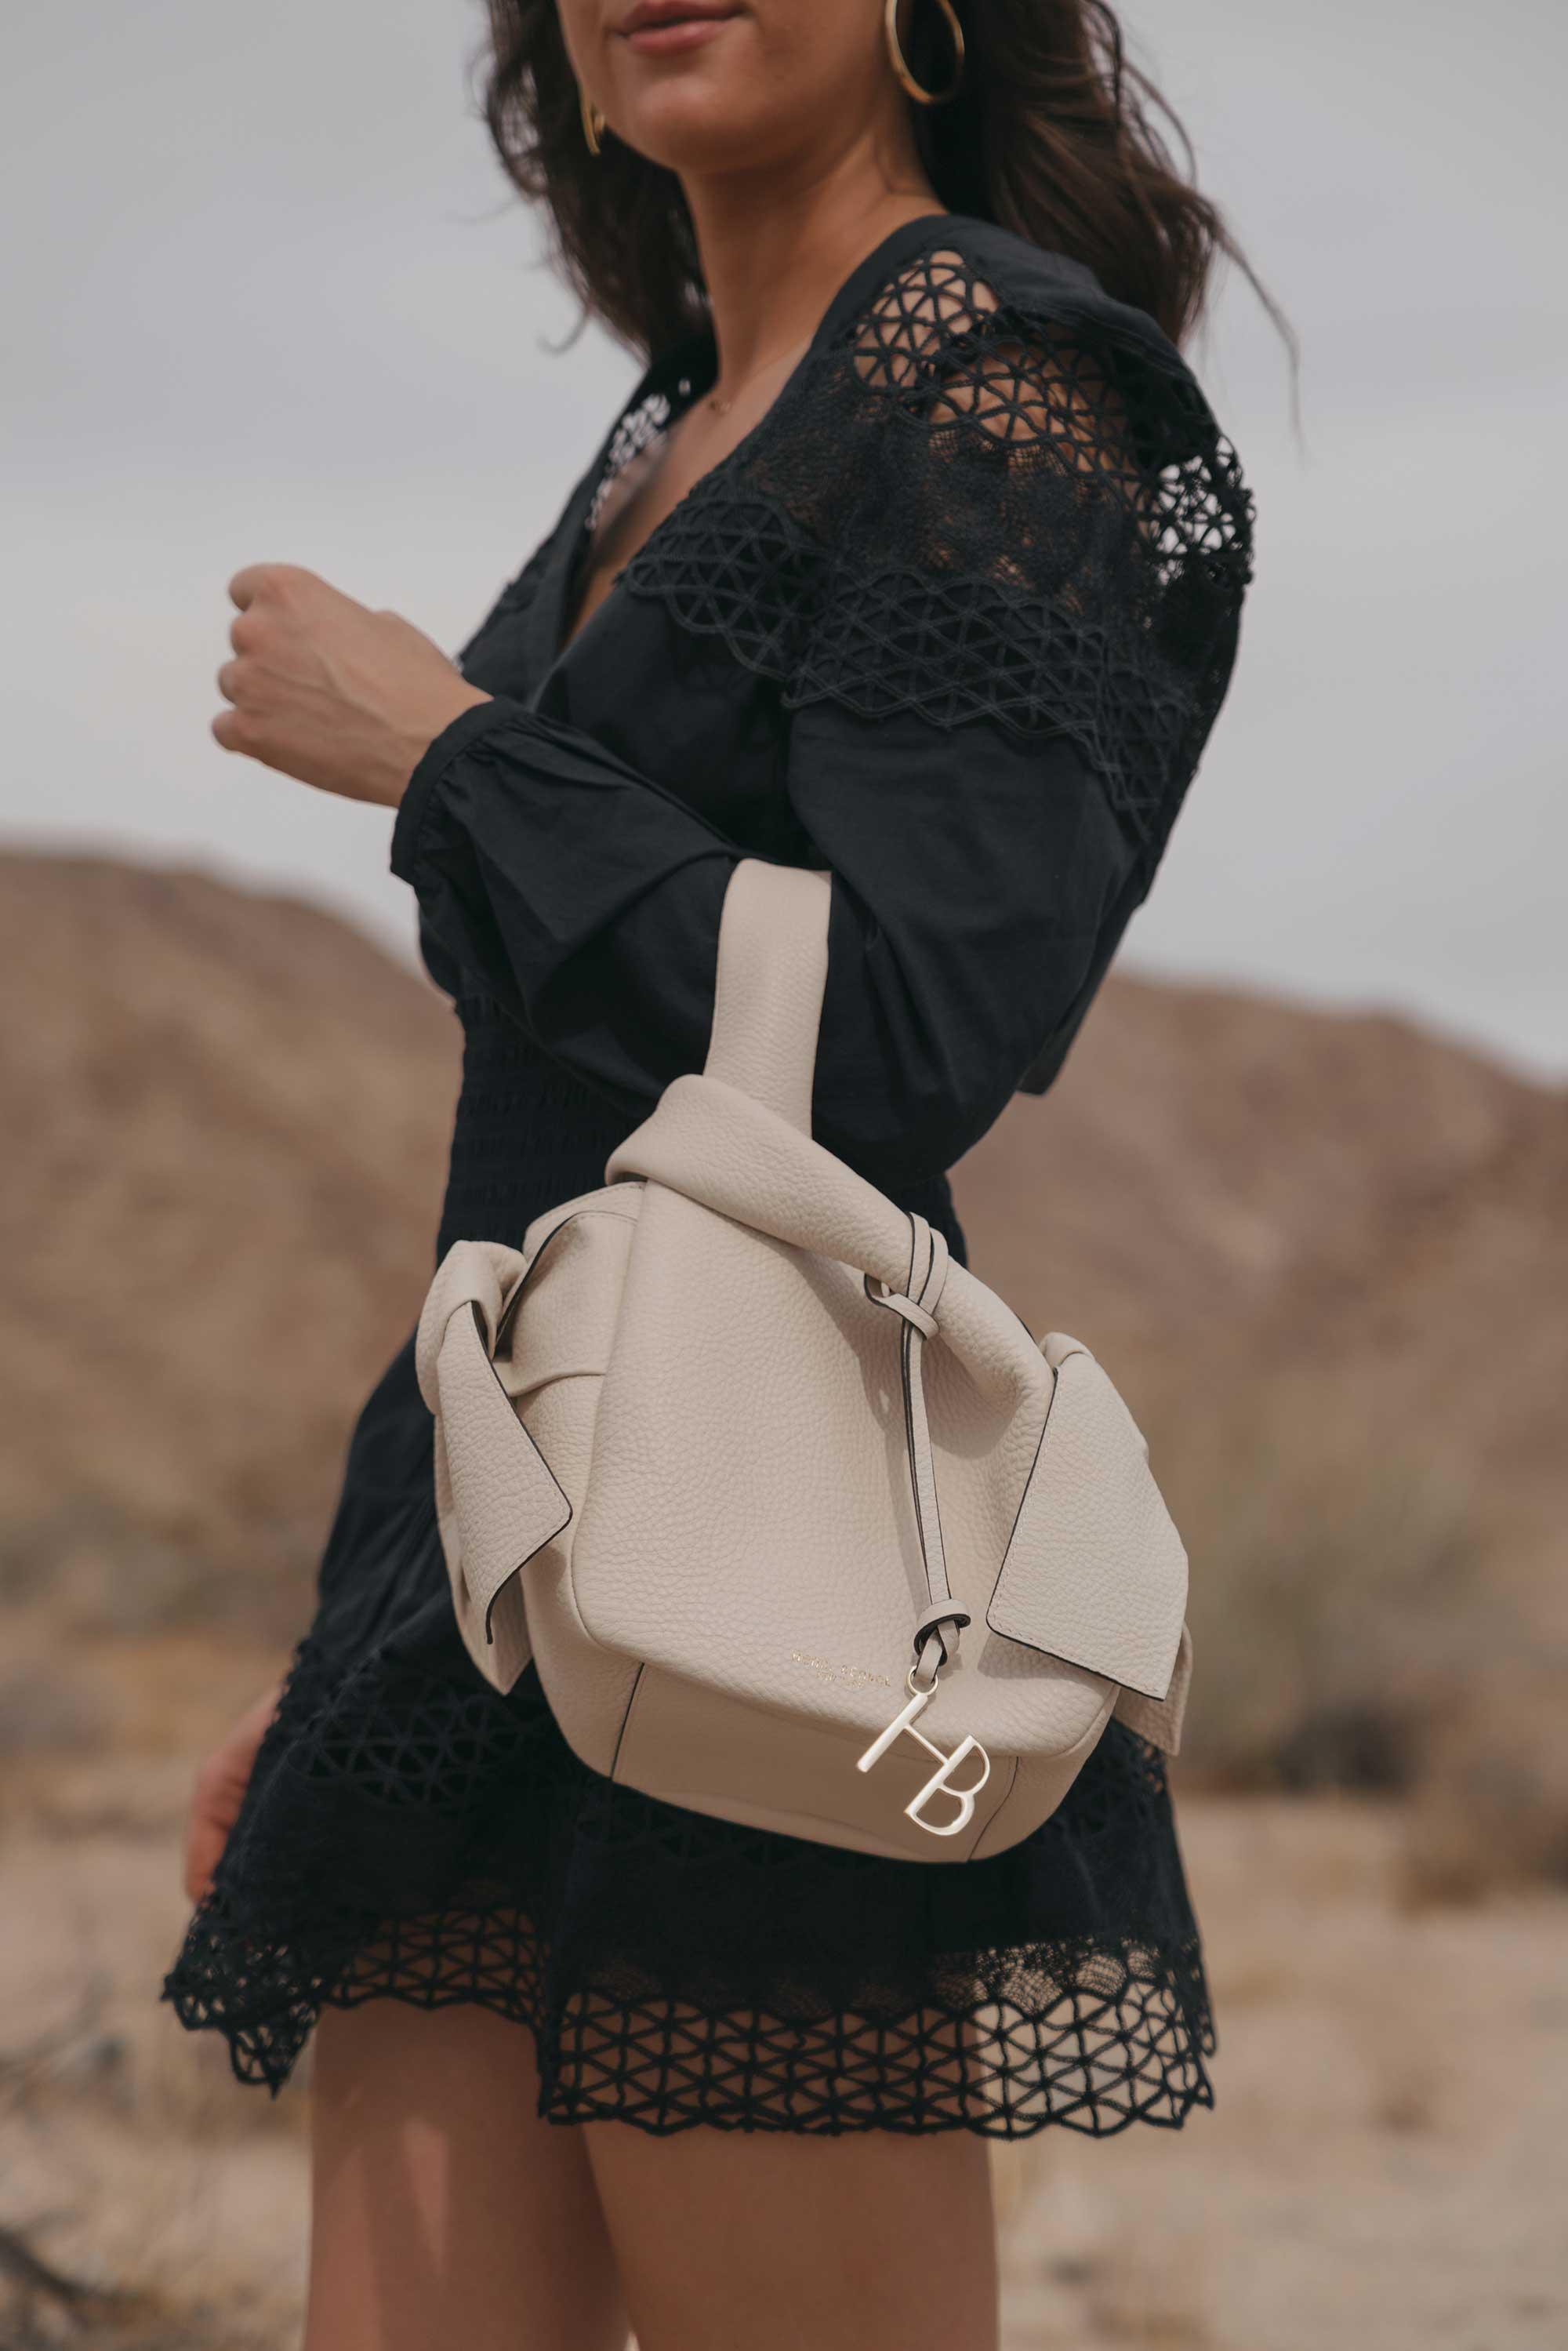 black lace festival outfit for Coachella Desert7.jpg